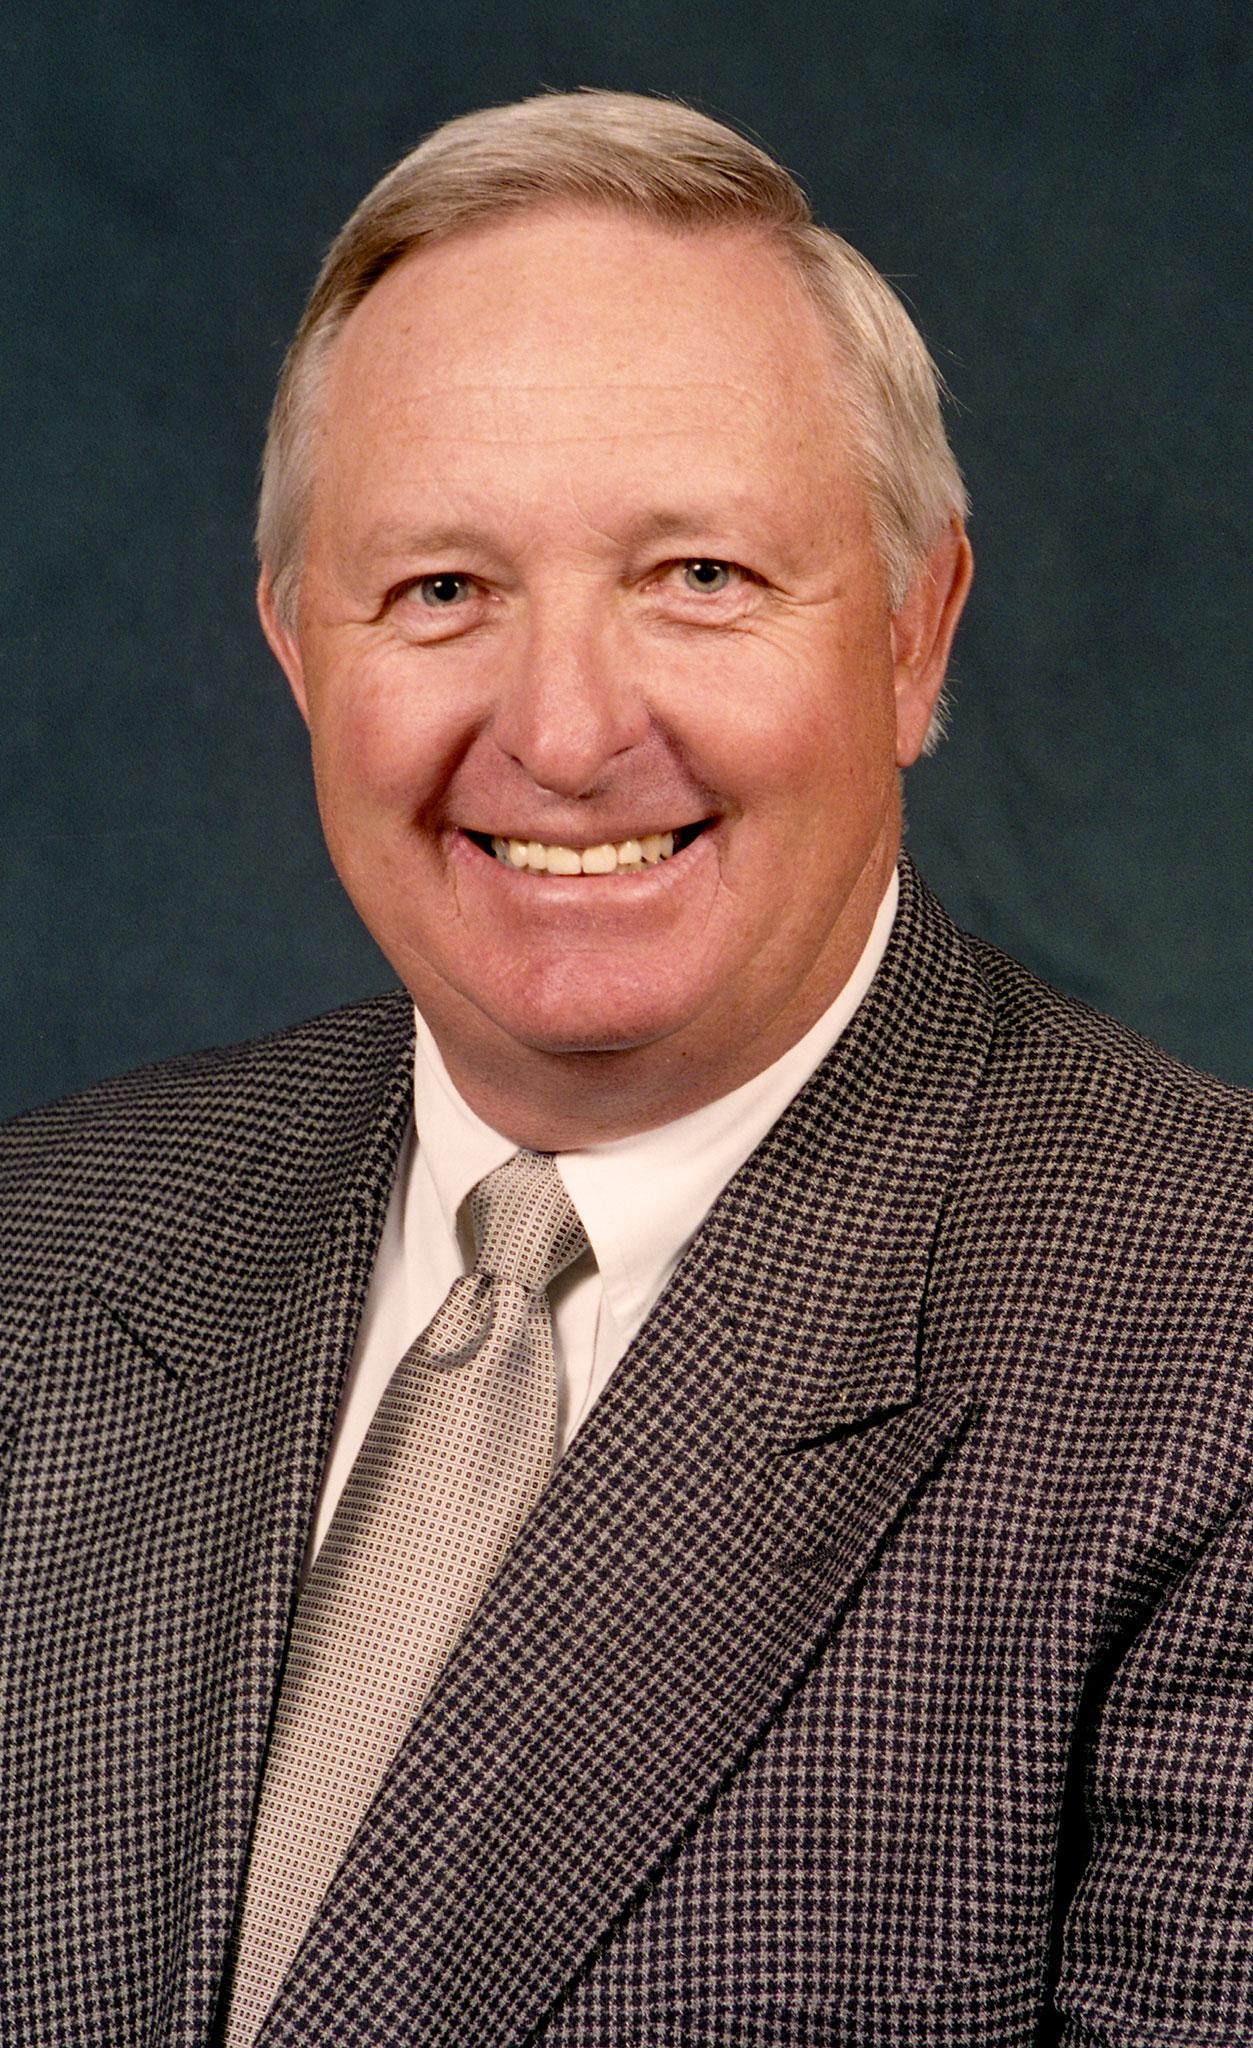 Steve Kouplen, Oklahoma Farm Bureau president